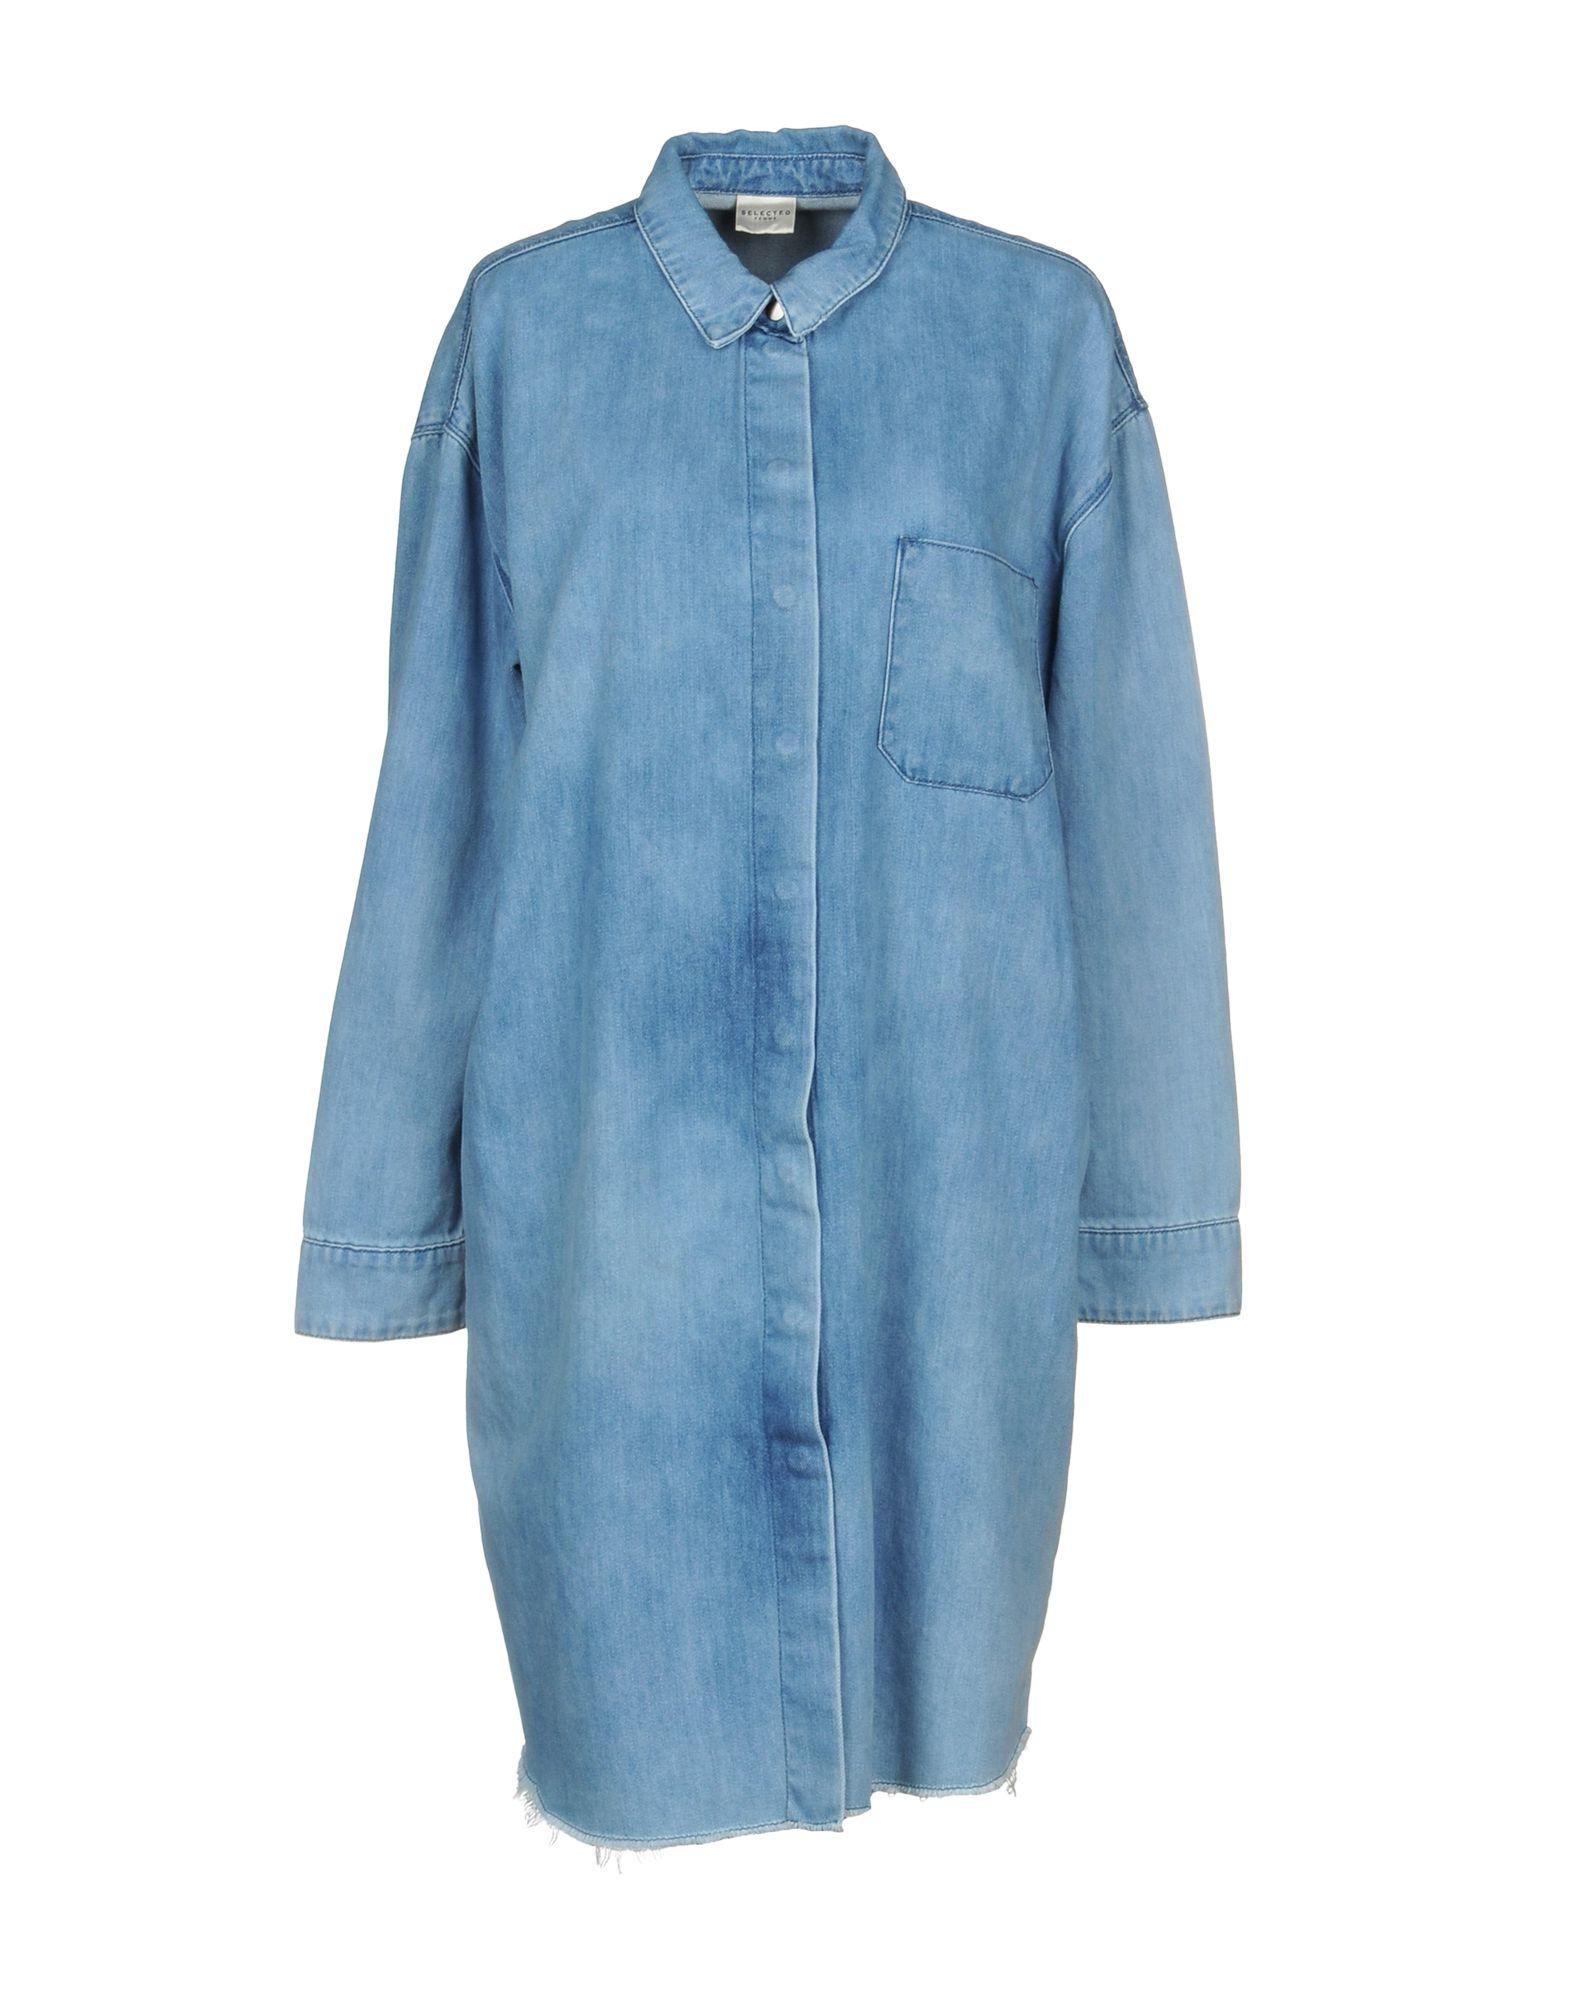 SELECTED FEMME Короткое платье рубашка женская selected femme цвет молочный 16052017 размер 40 46